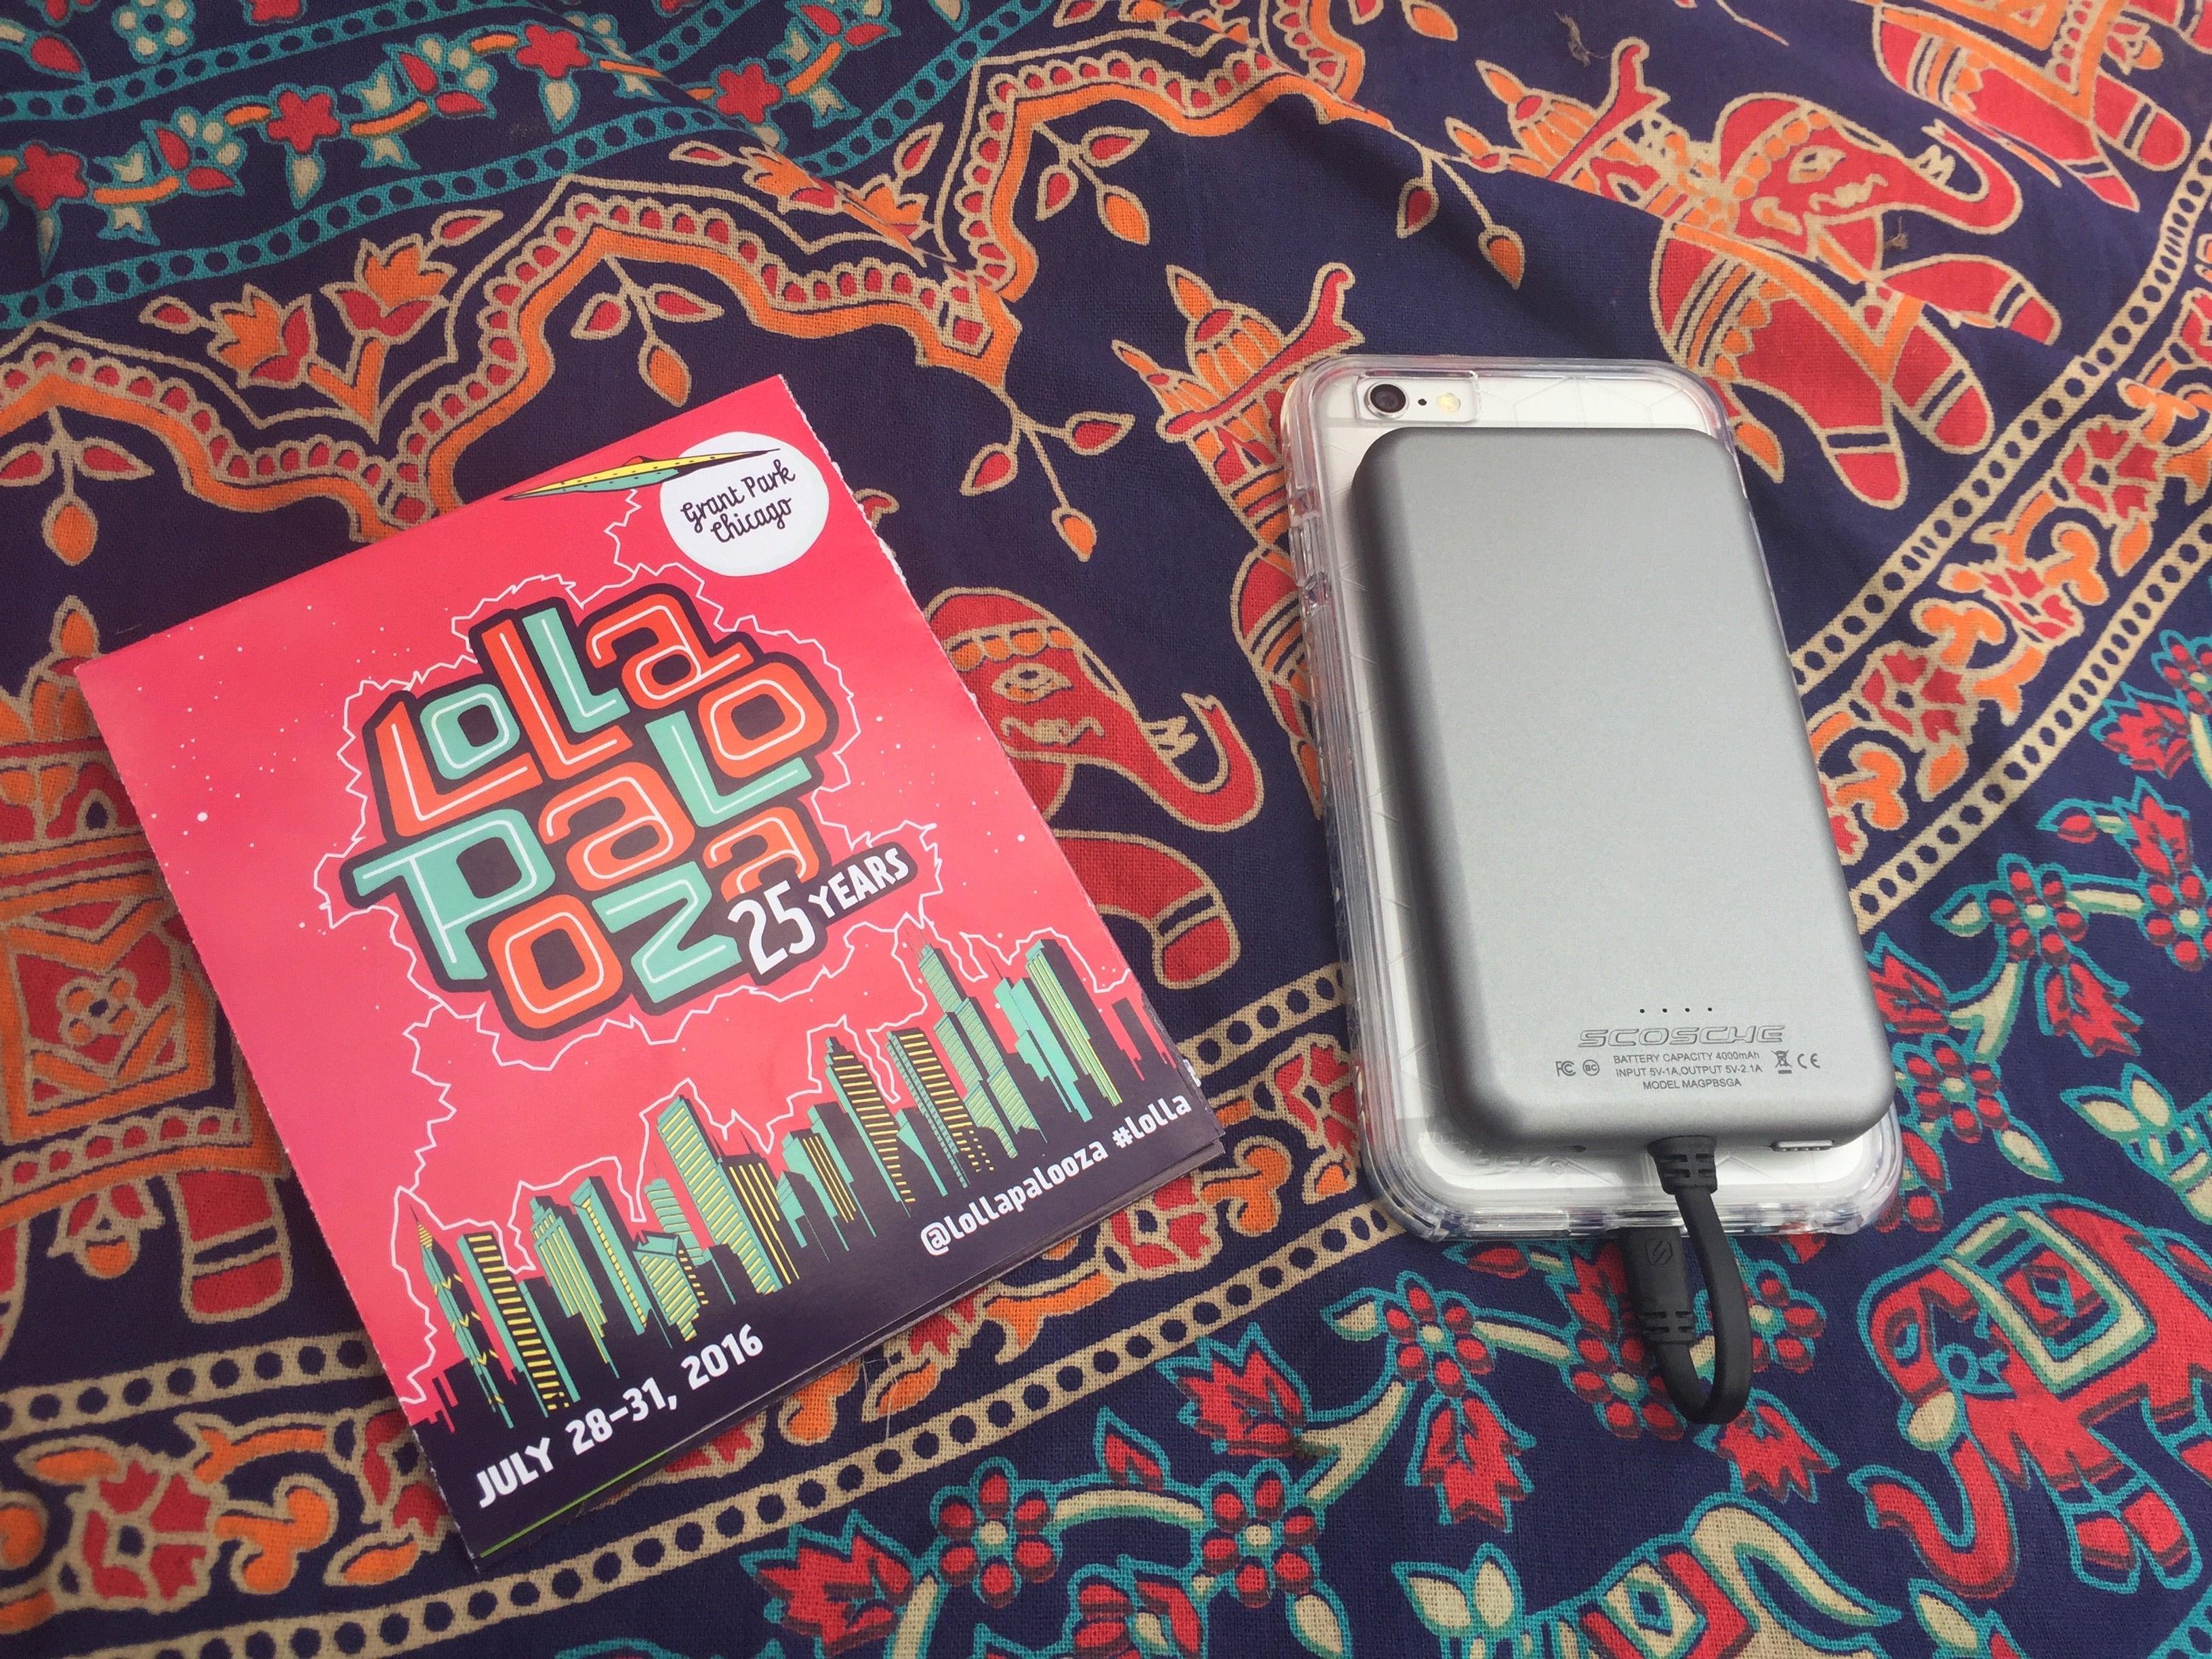 Optimized for Music Festivals - Lollapalooza 2016